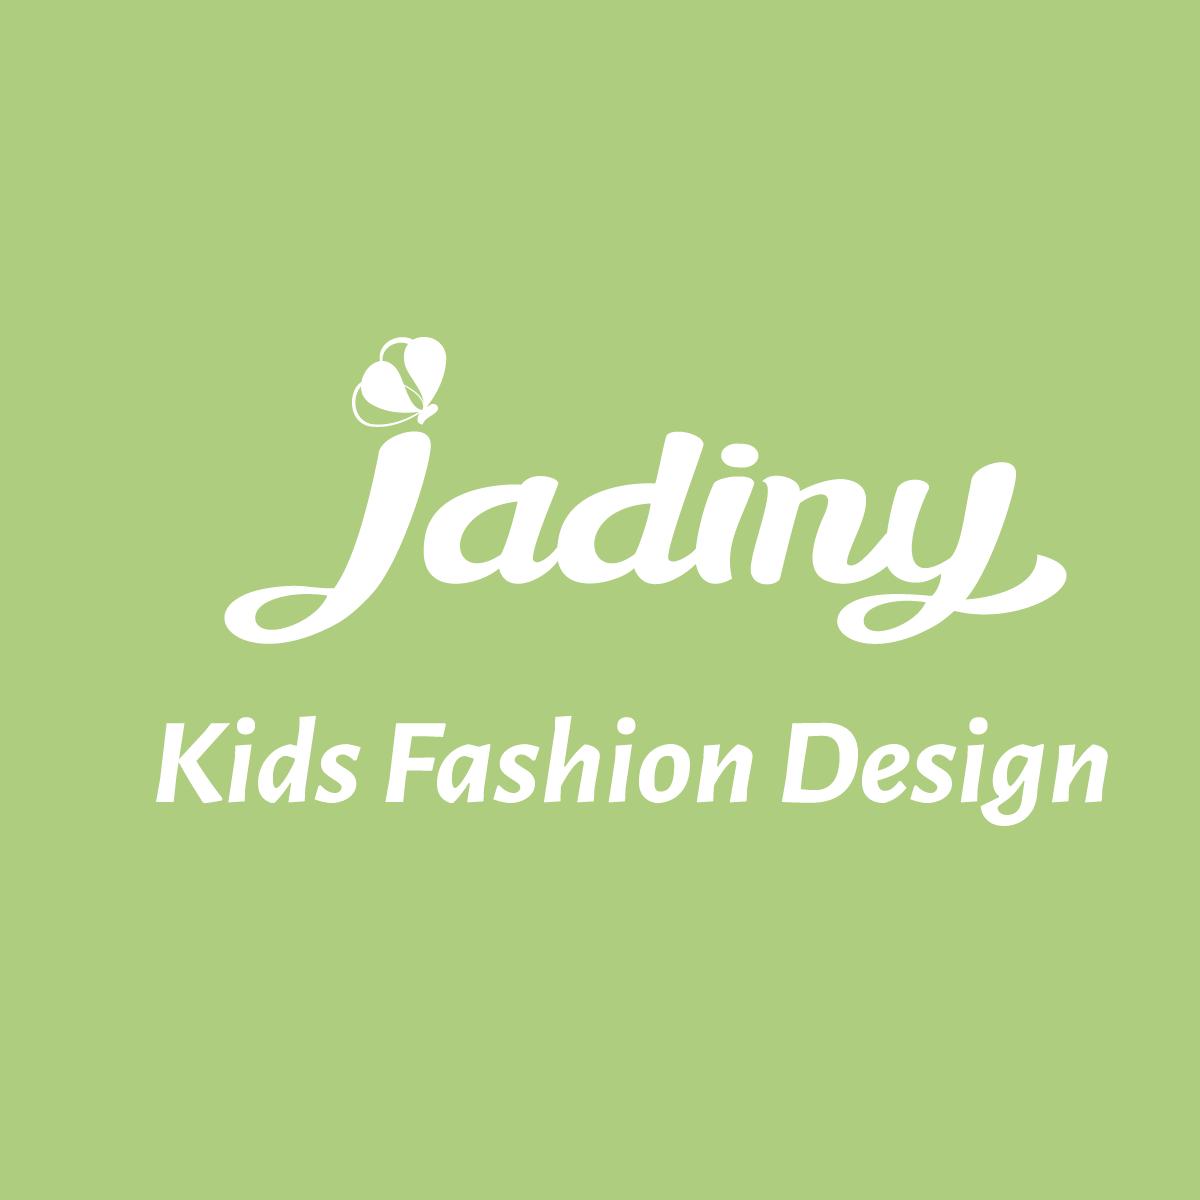 Công ty Jadiny